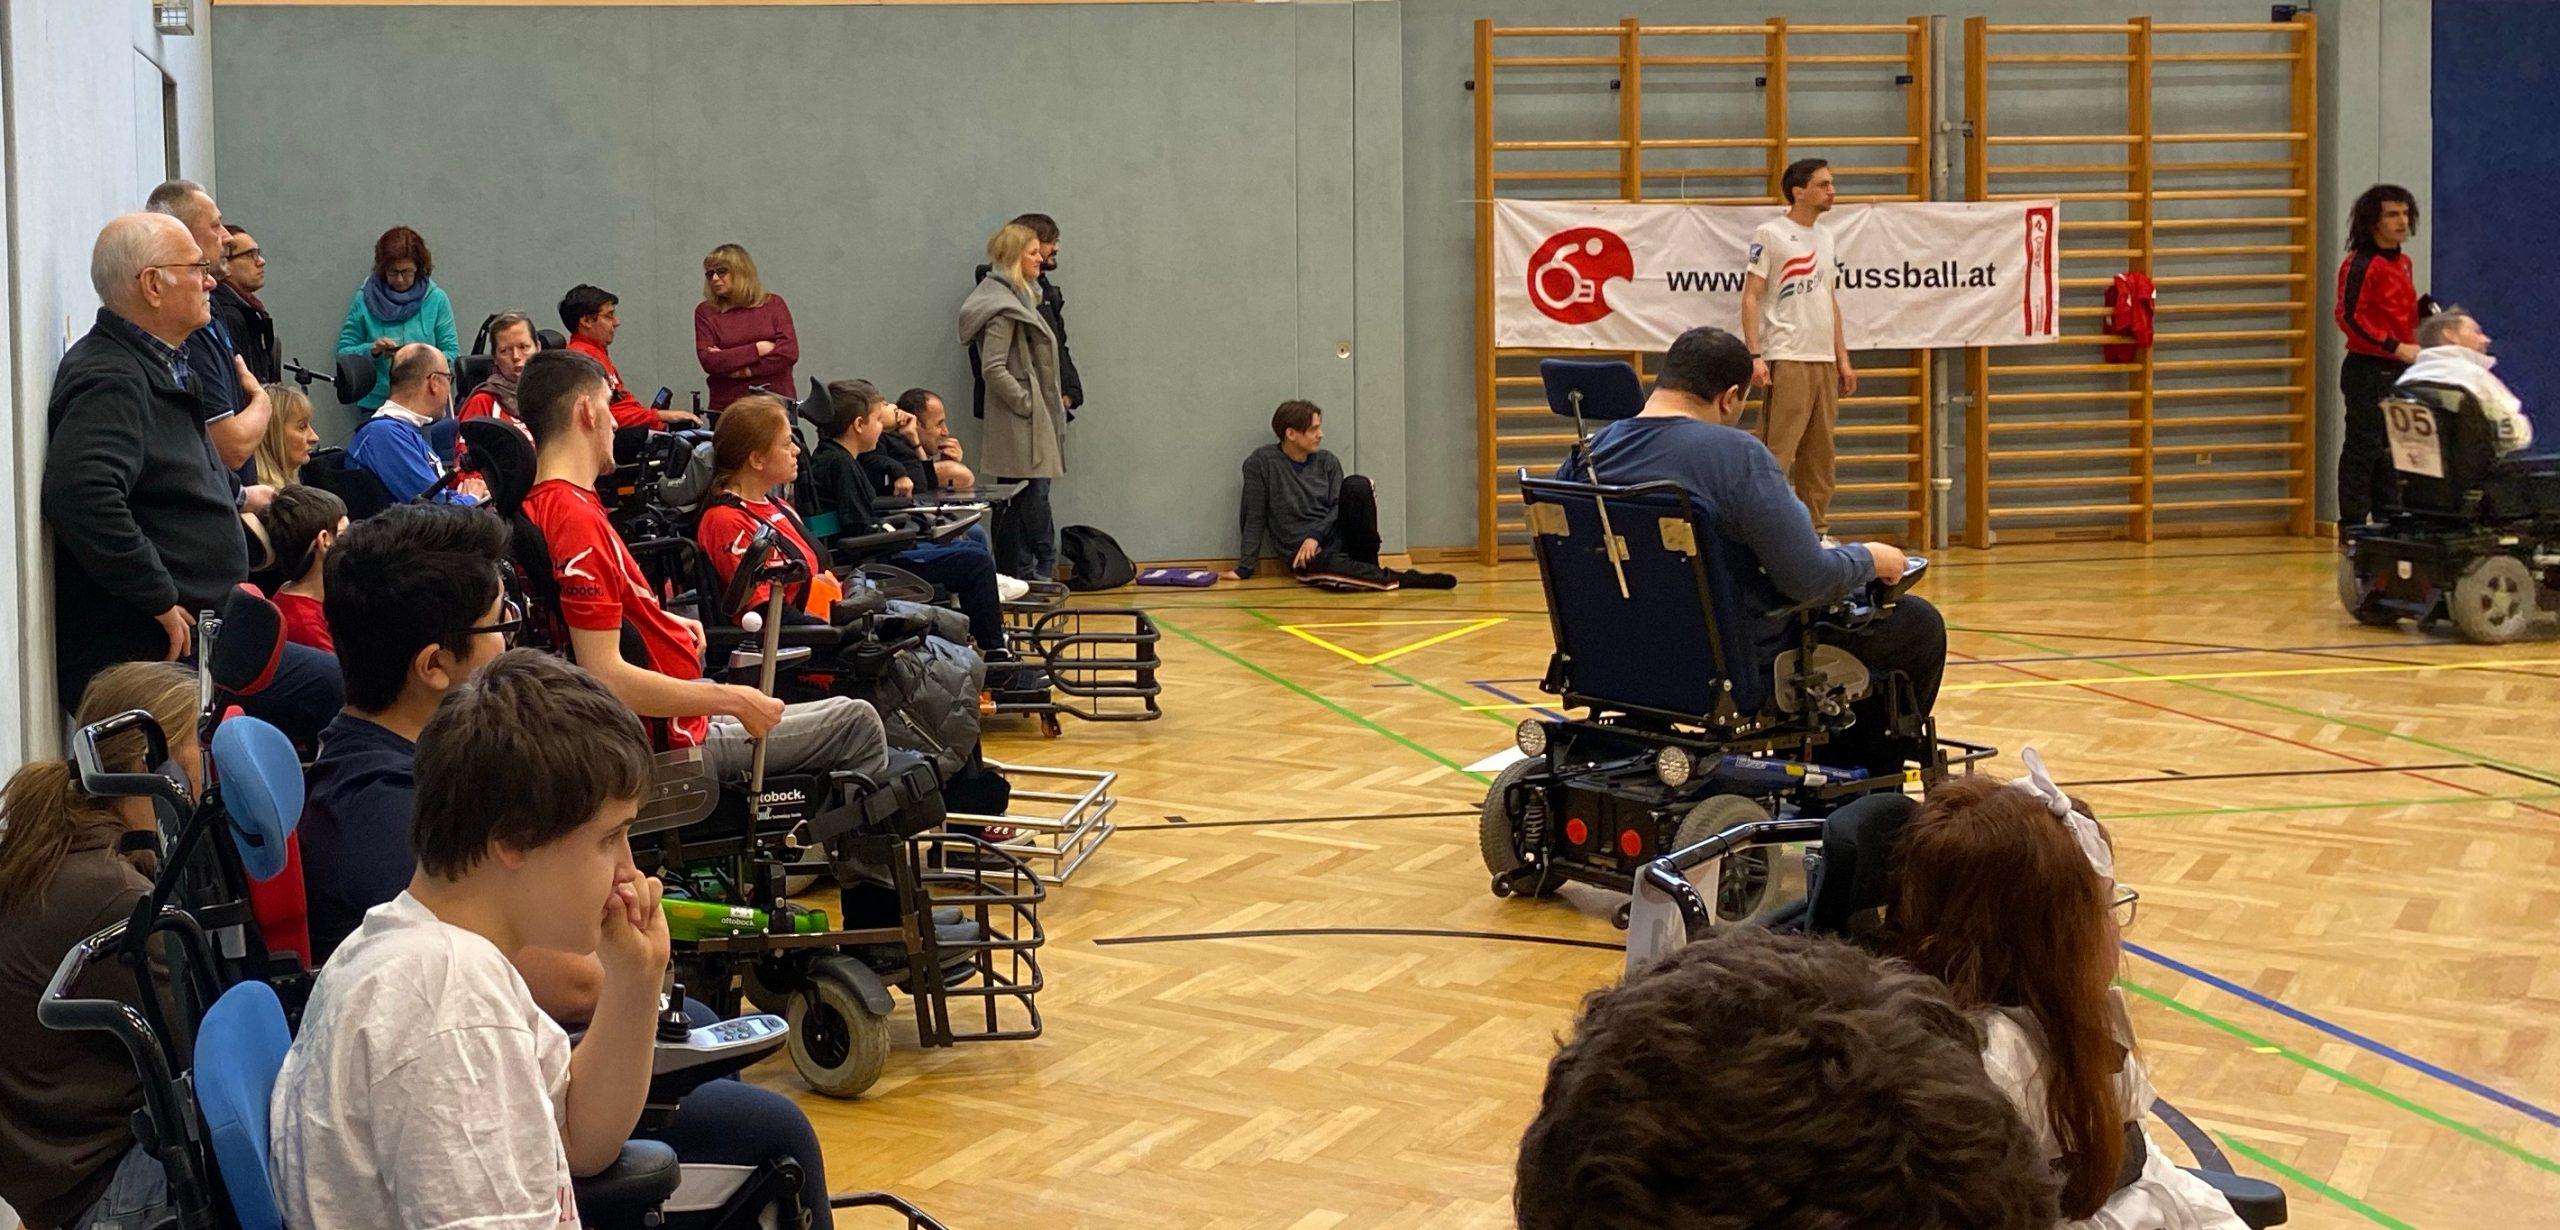 Großer Andrang beim ASKÖ Player's CUP am 25. Jänner 2020 in Wien